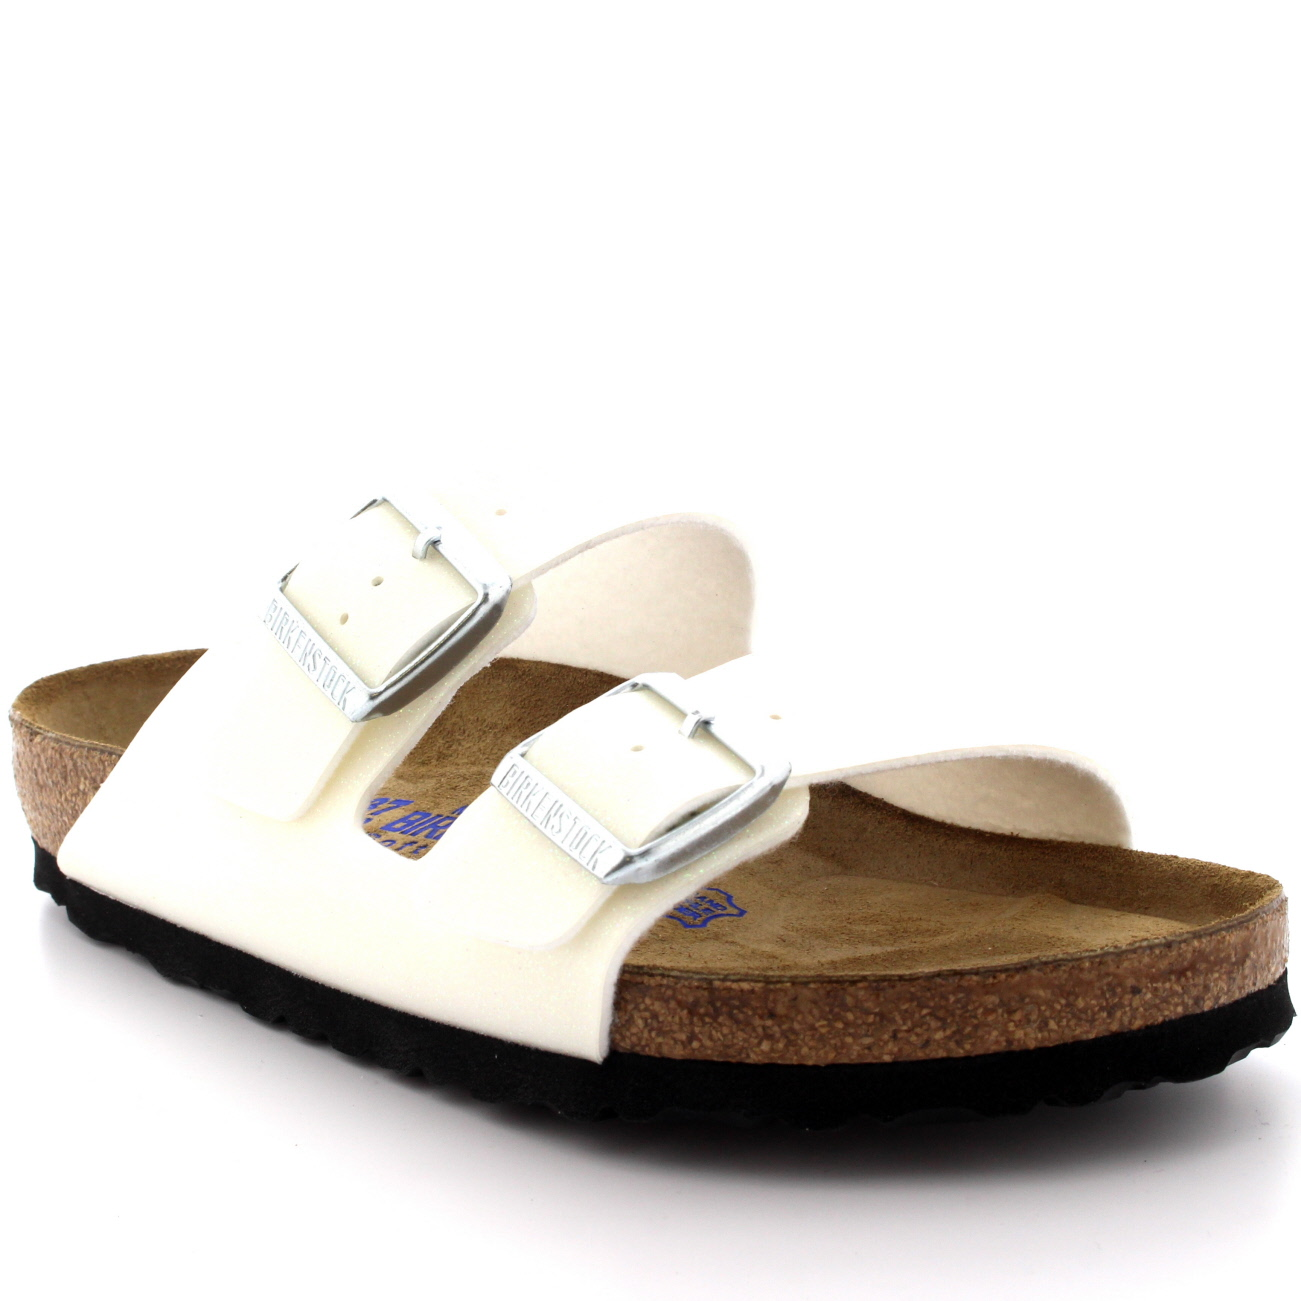 Womens Arizona Open Toe Sandals Birkenstock c3AamFCcaH